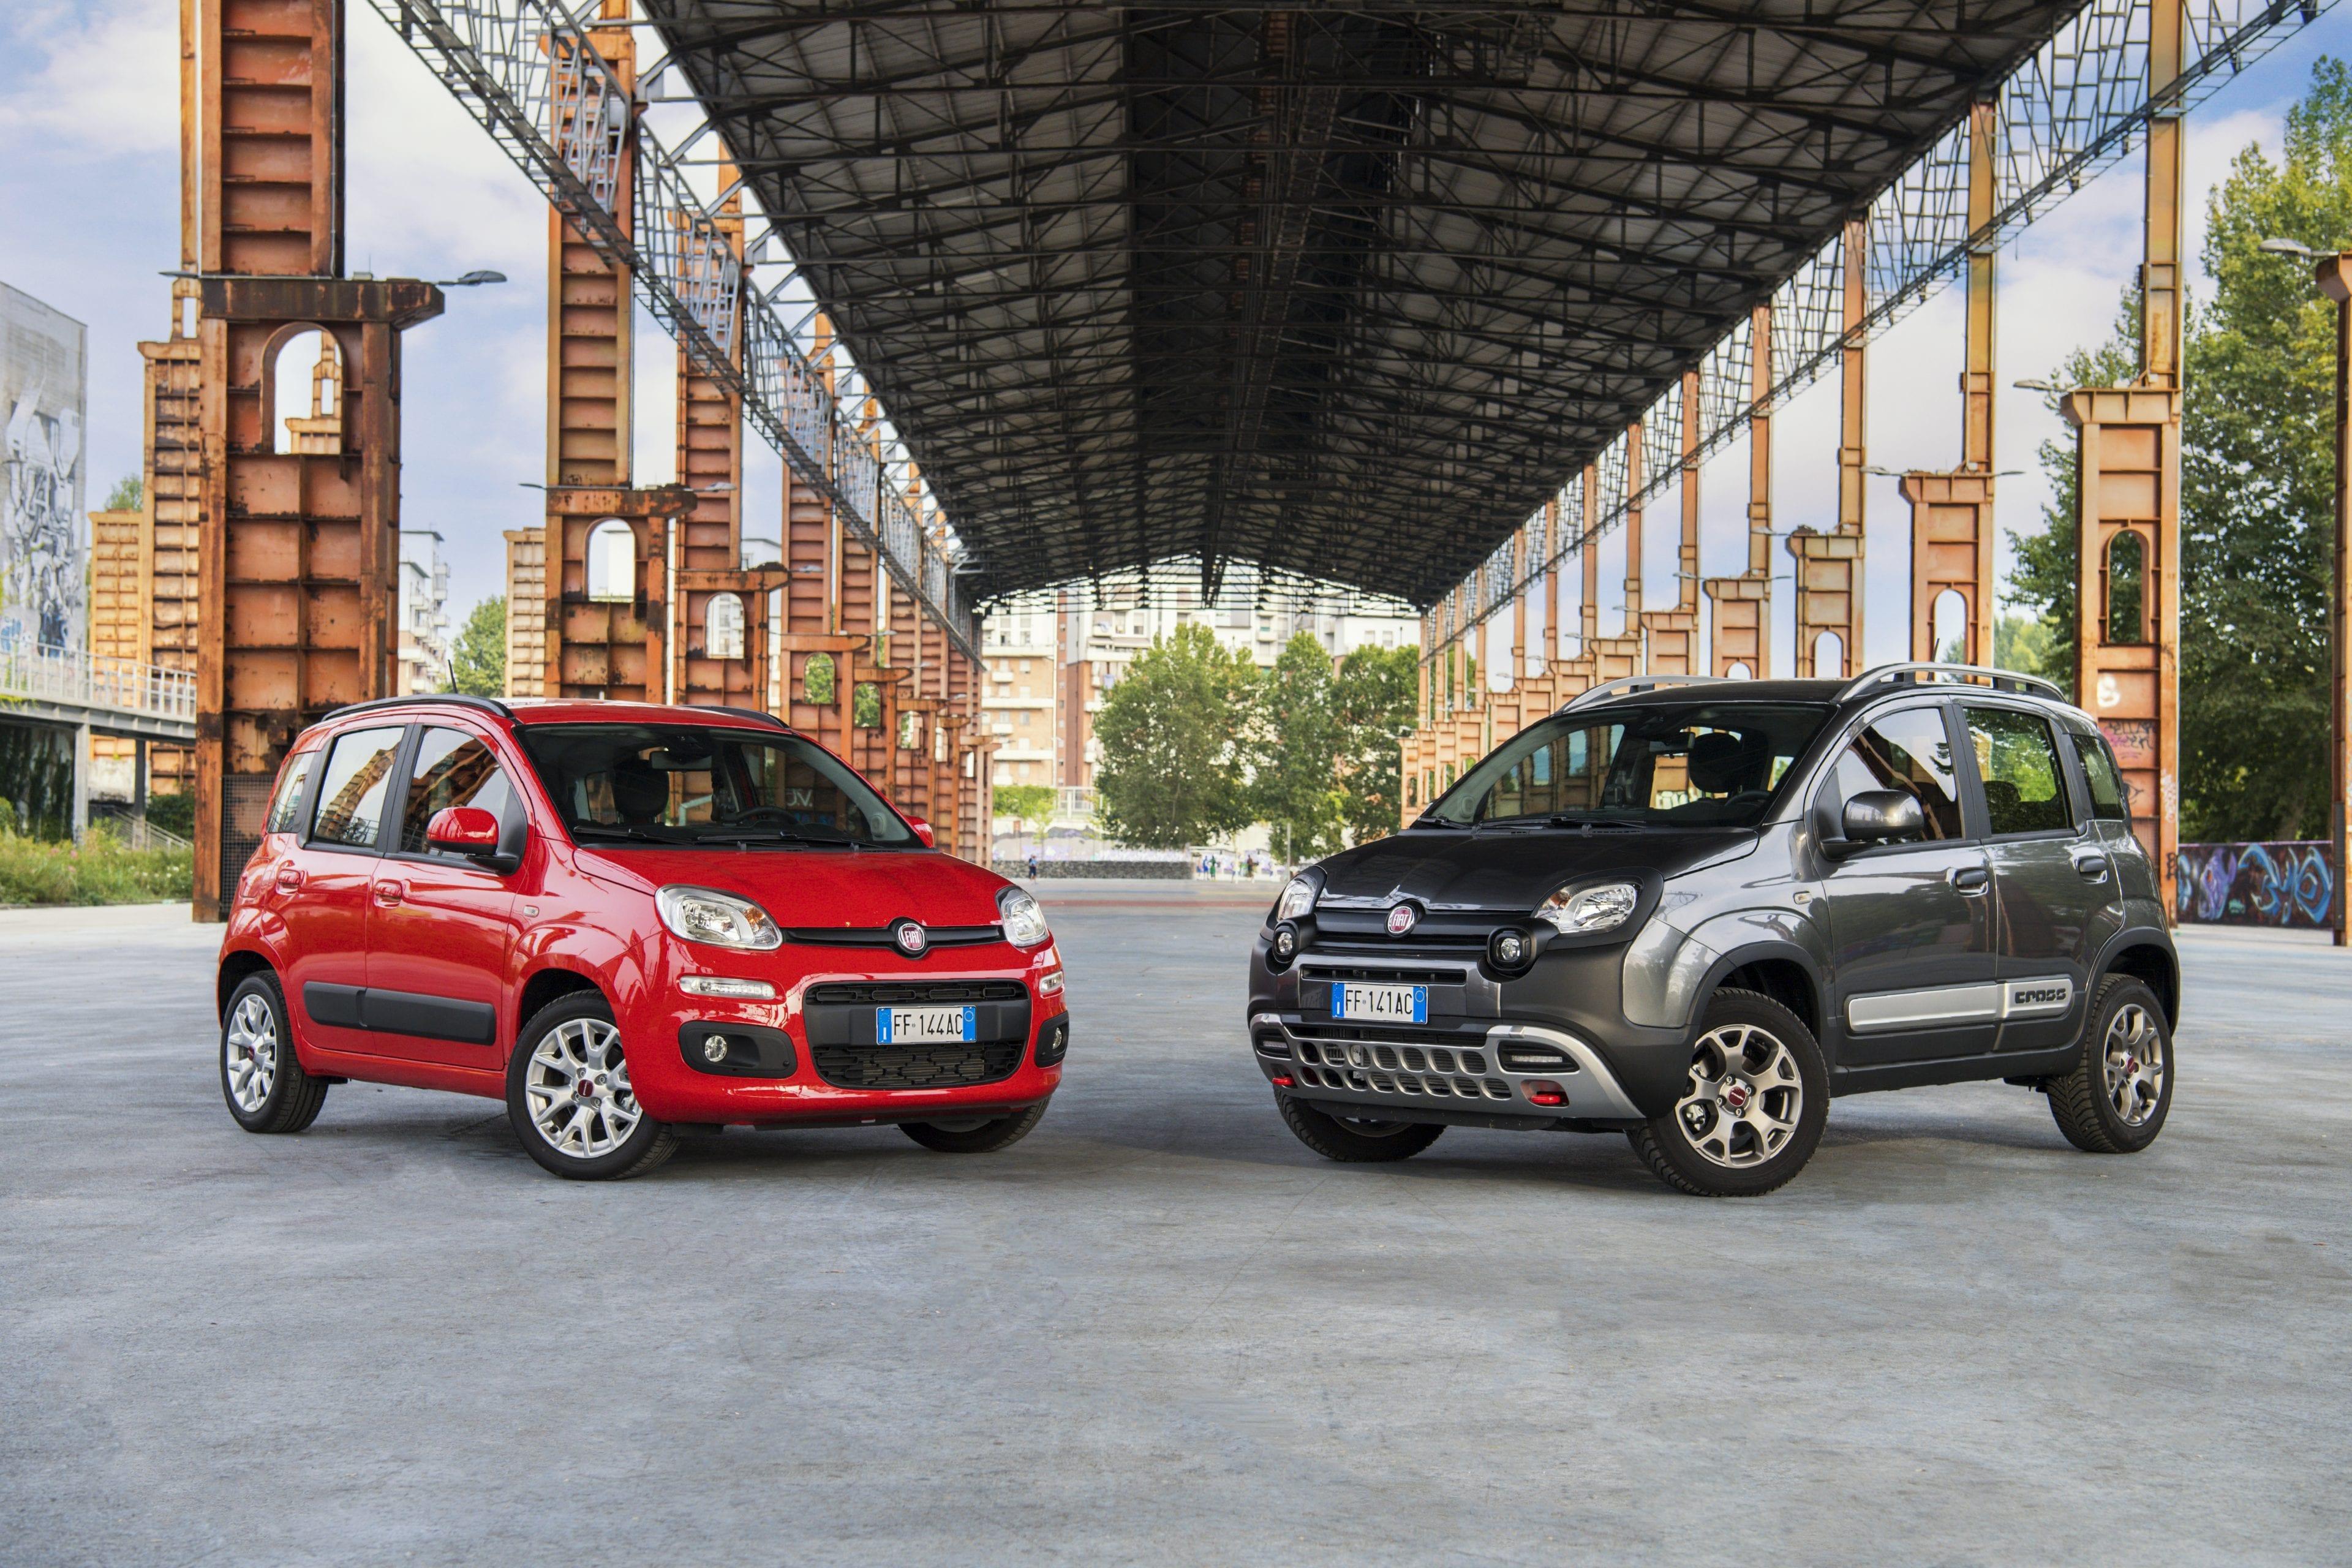 Fiat_Panda duo